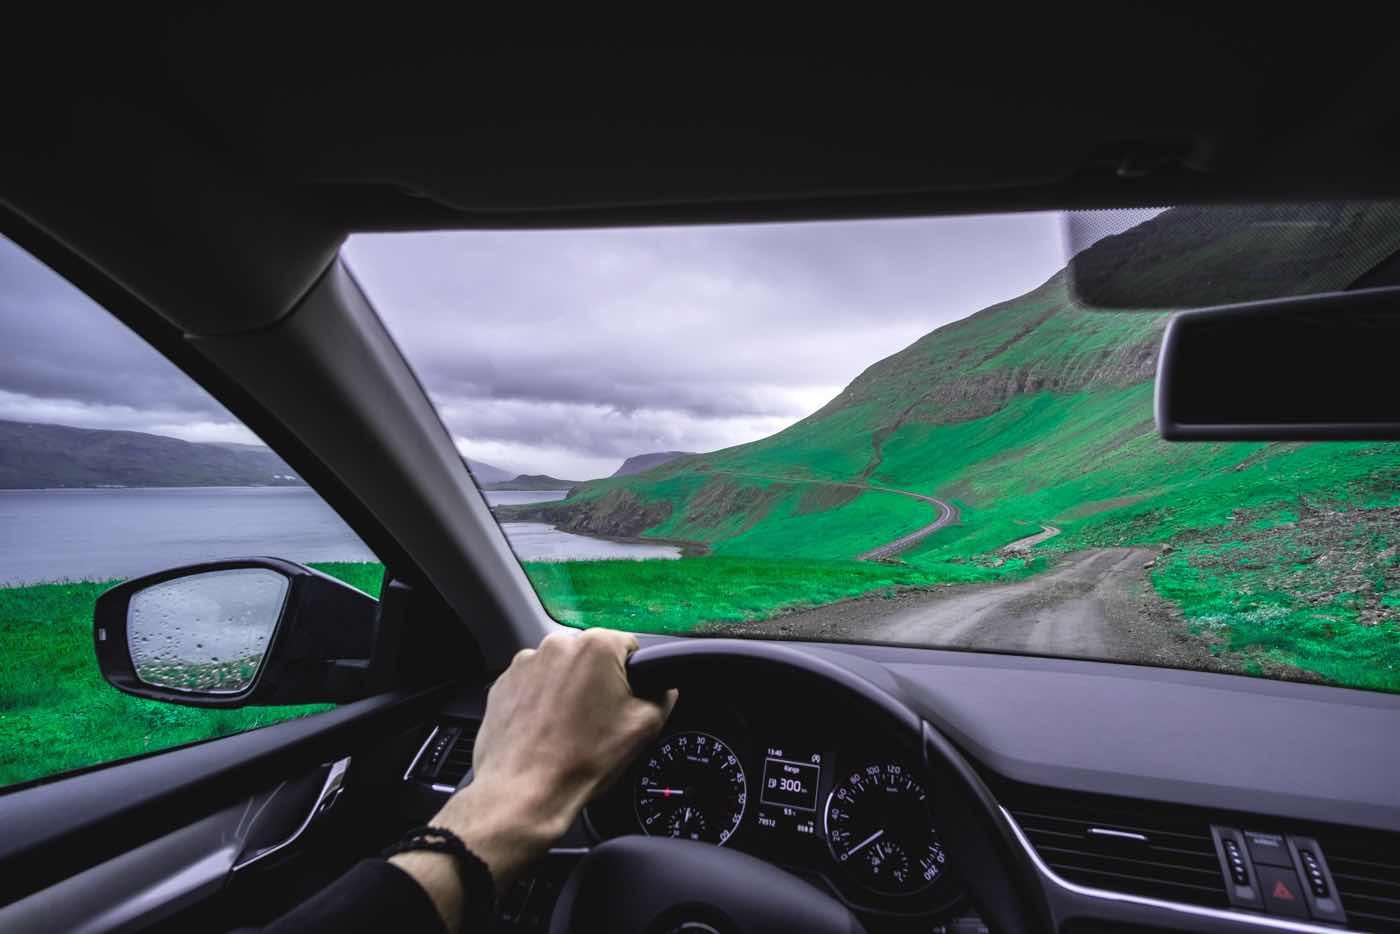 car rental tips renting car abroad